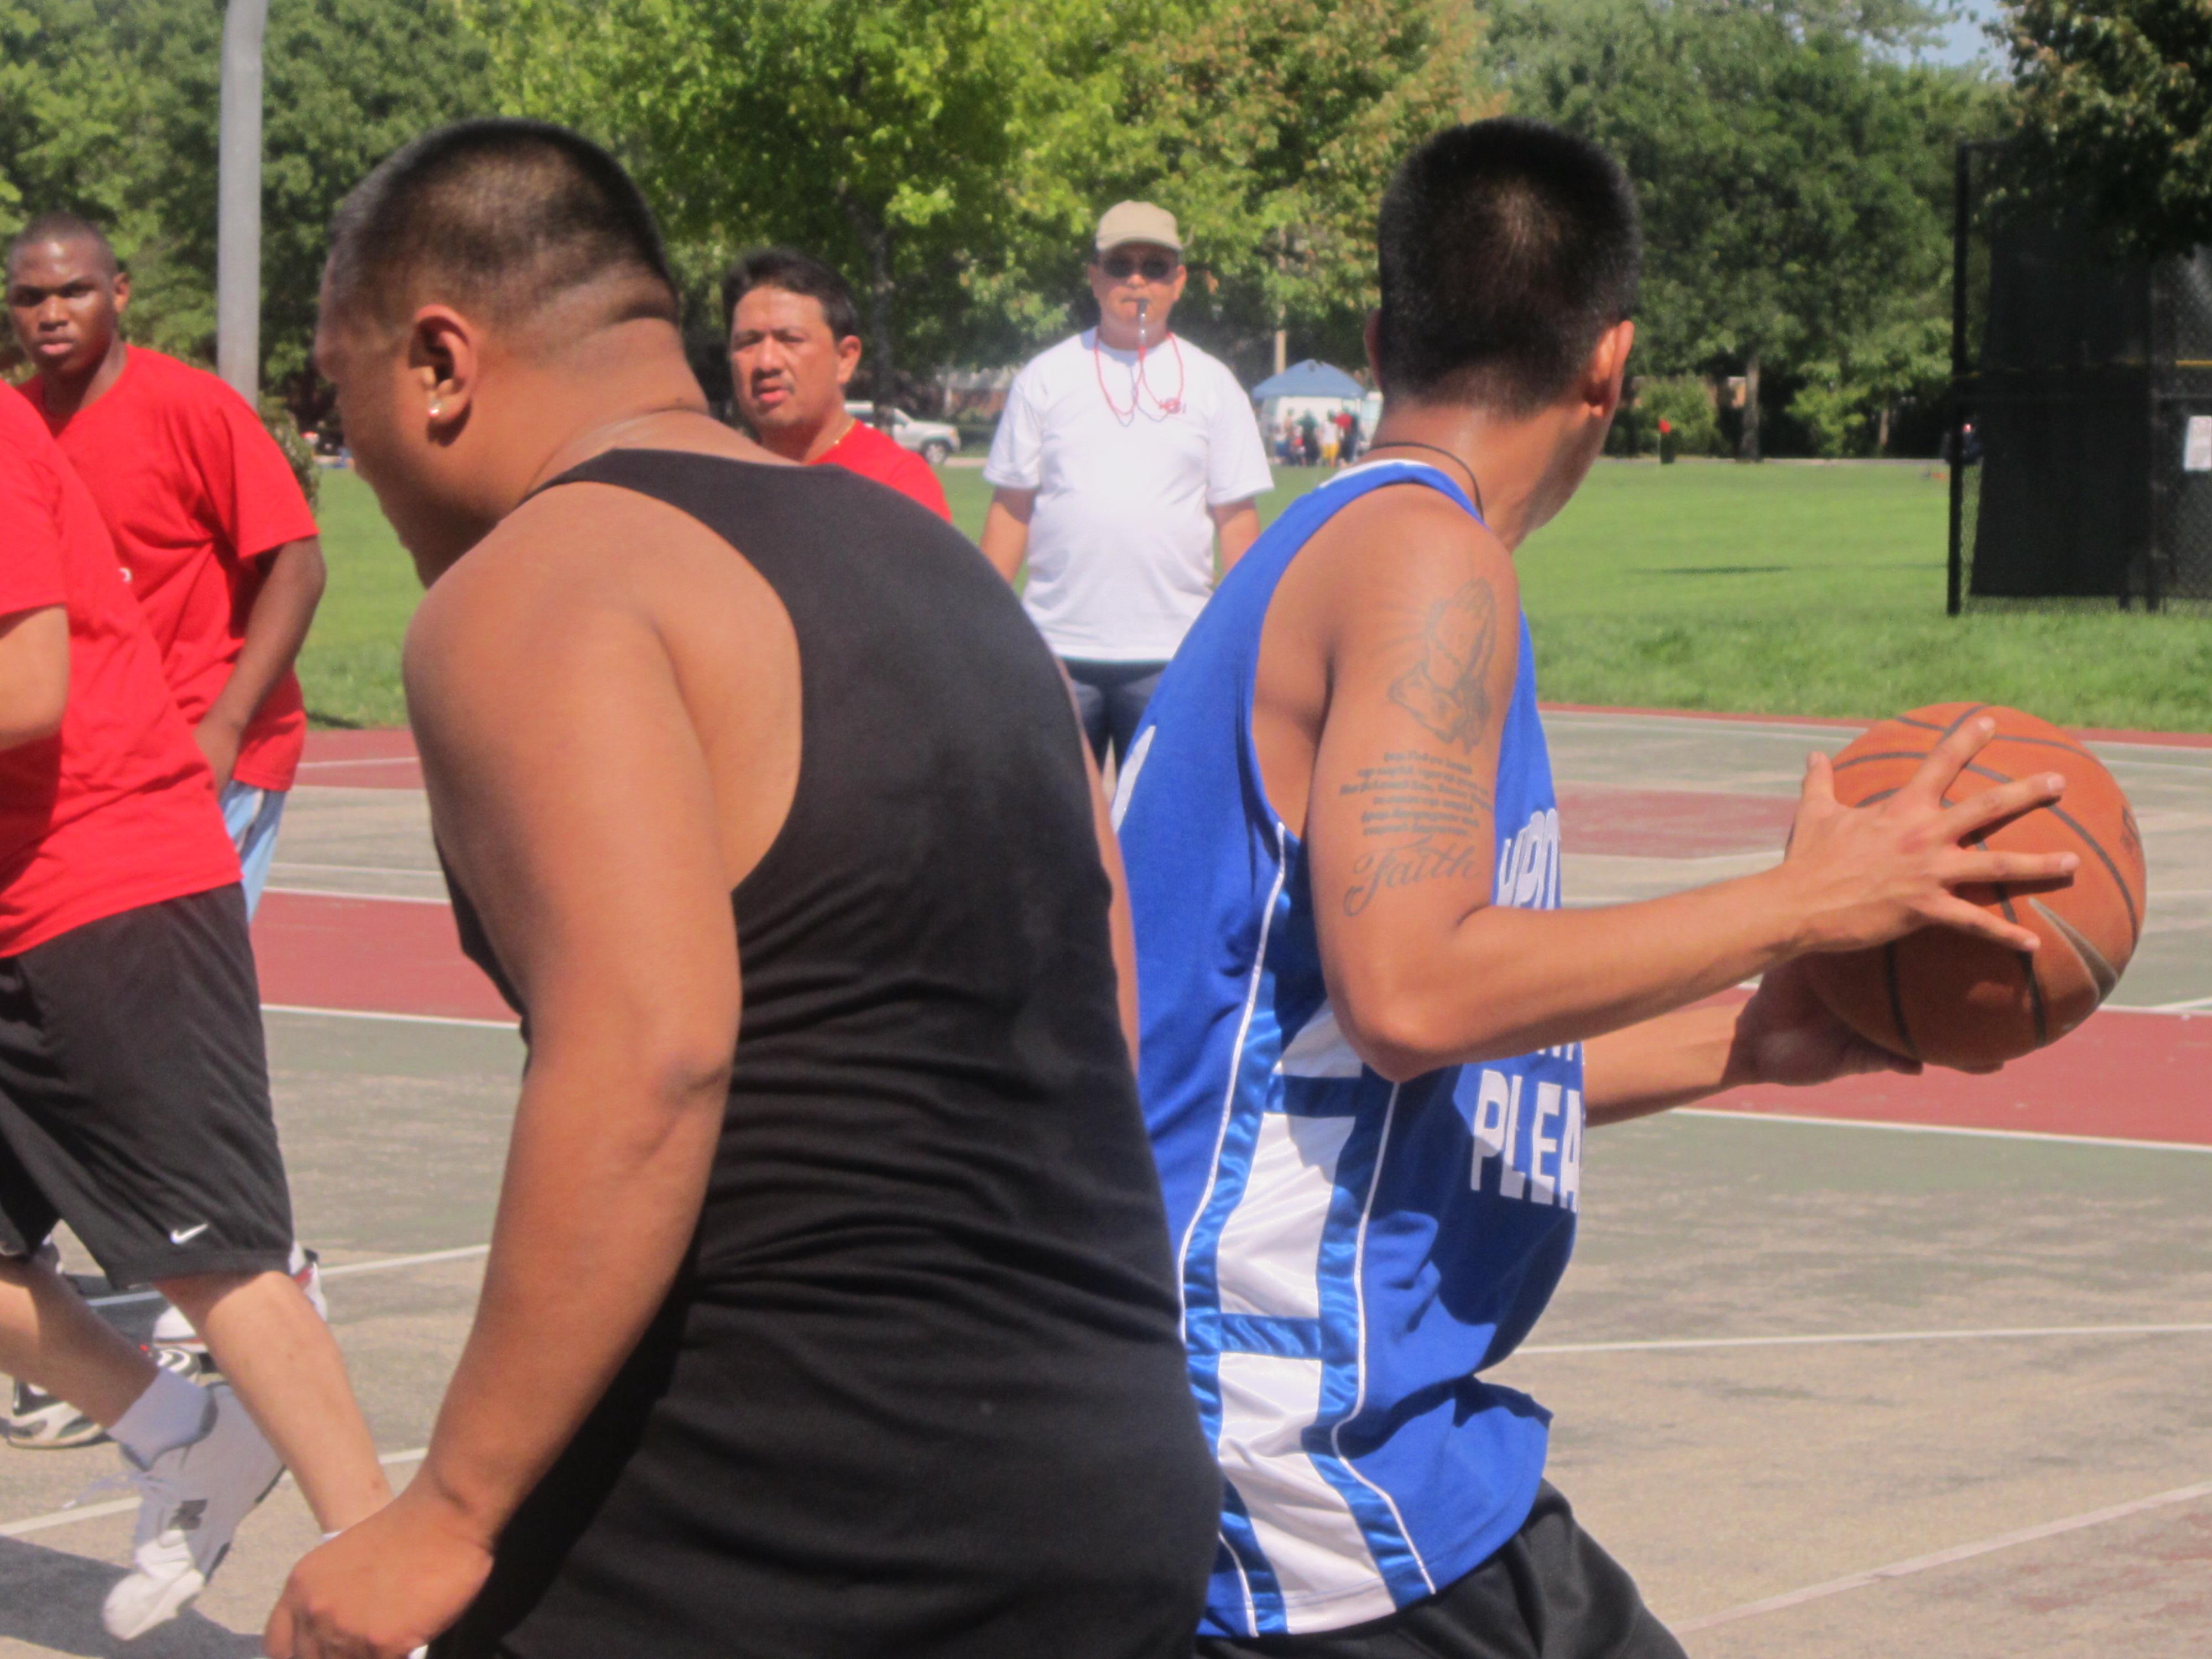 ICI Chicago nursing school sportsfest photo (53).jpg